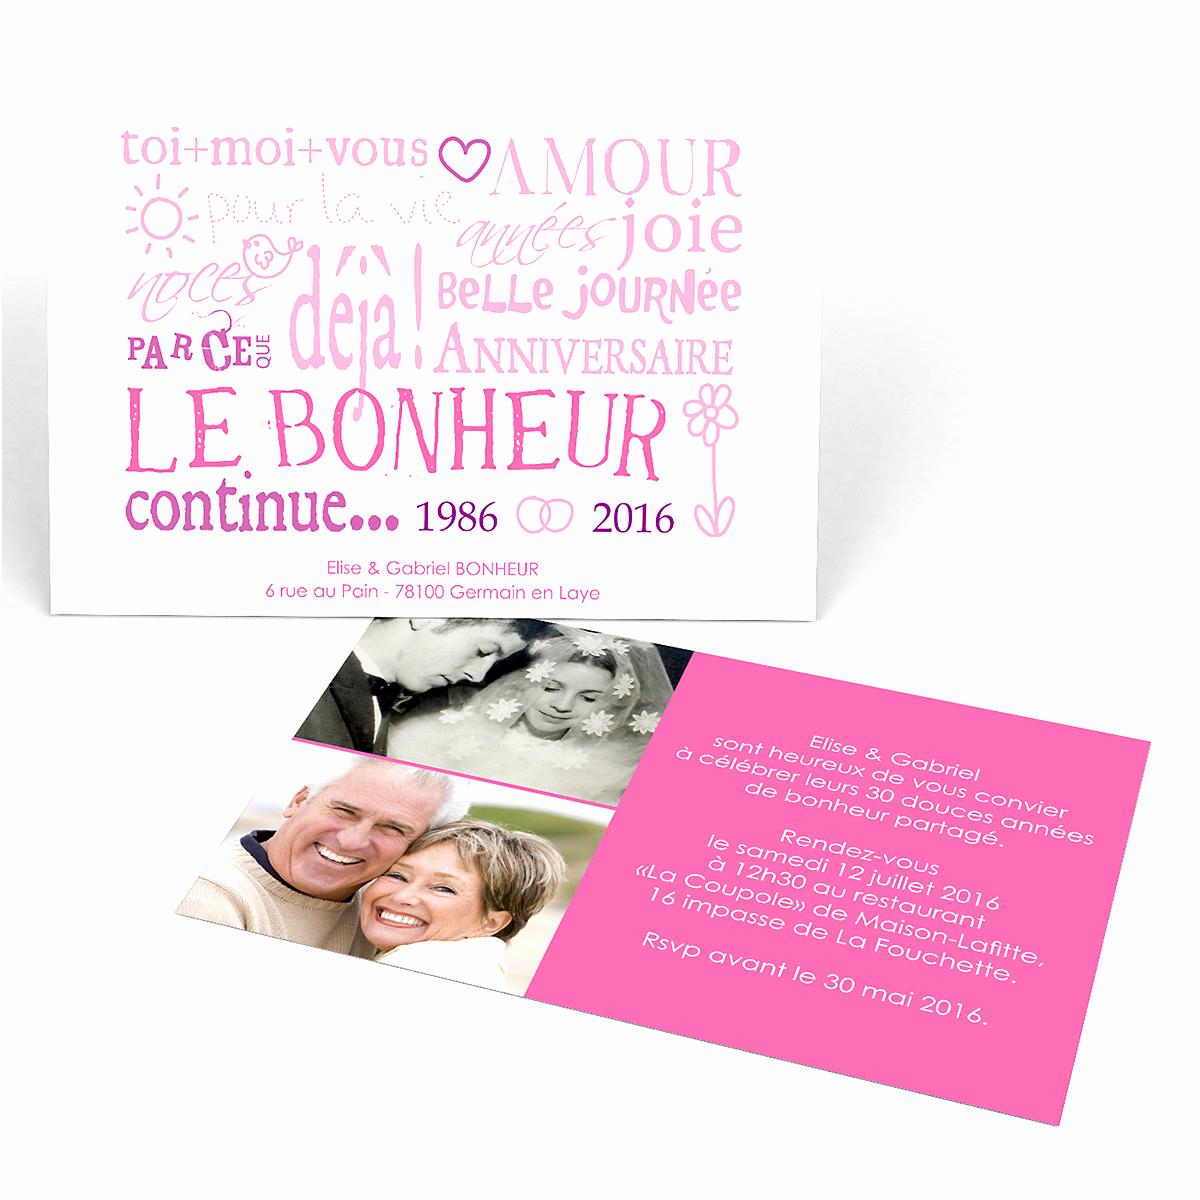 Modele invitation anniversaire de mariage 30 ans - Elevagequalitetouraine